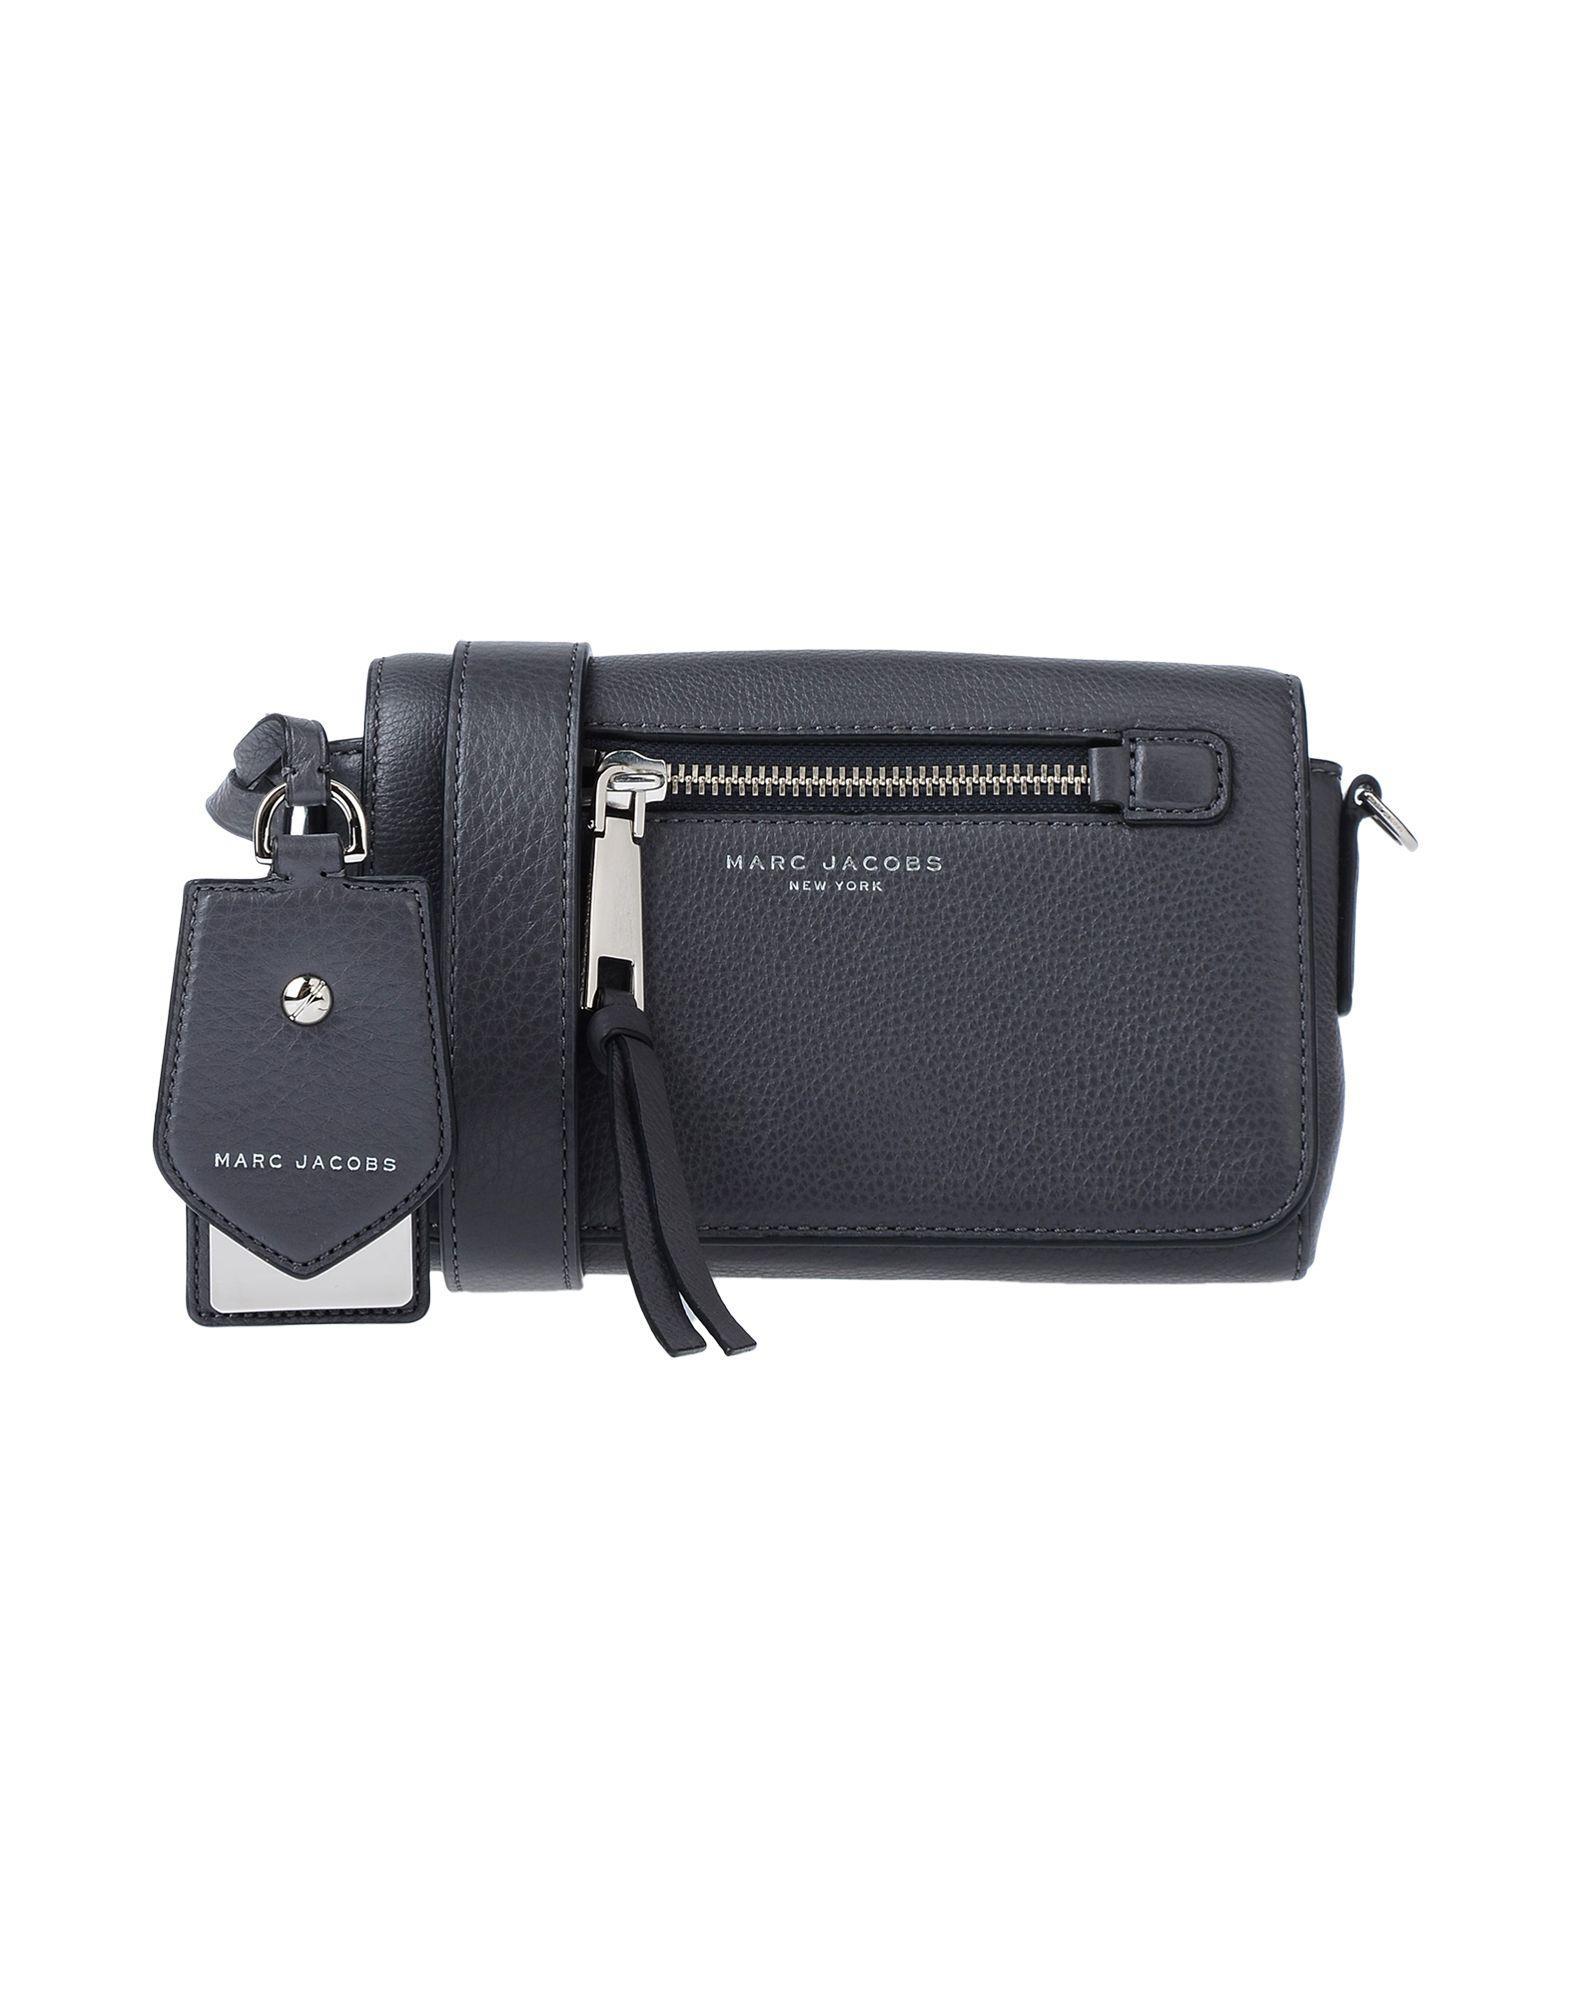 a67690fea55d Marc Jacobs - Multicolor Cross-body Bag - Lyst. View fullscreen